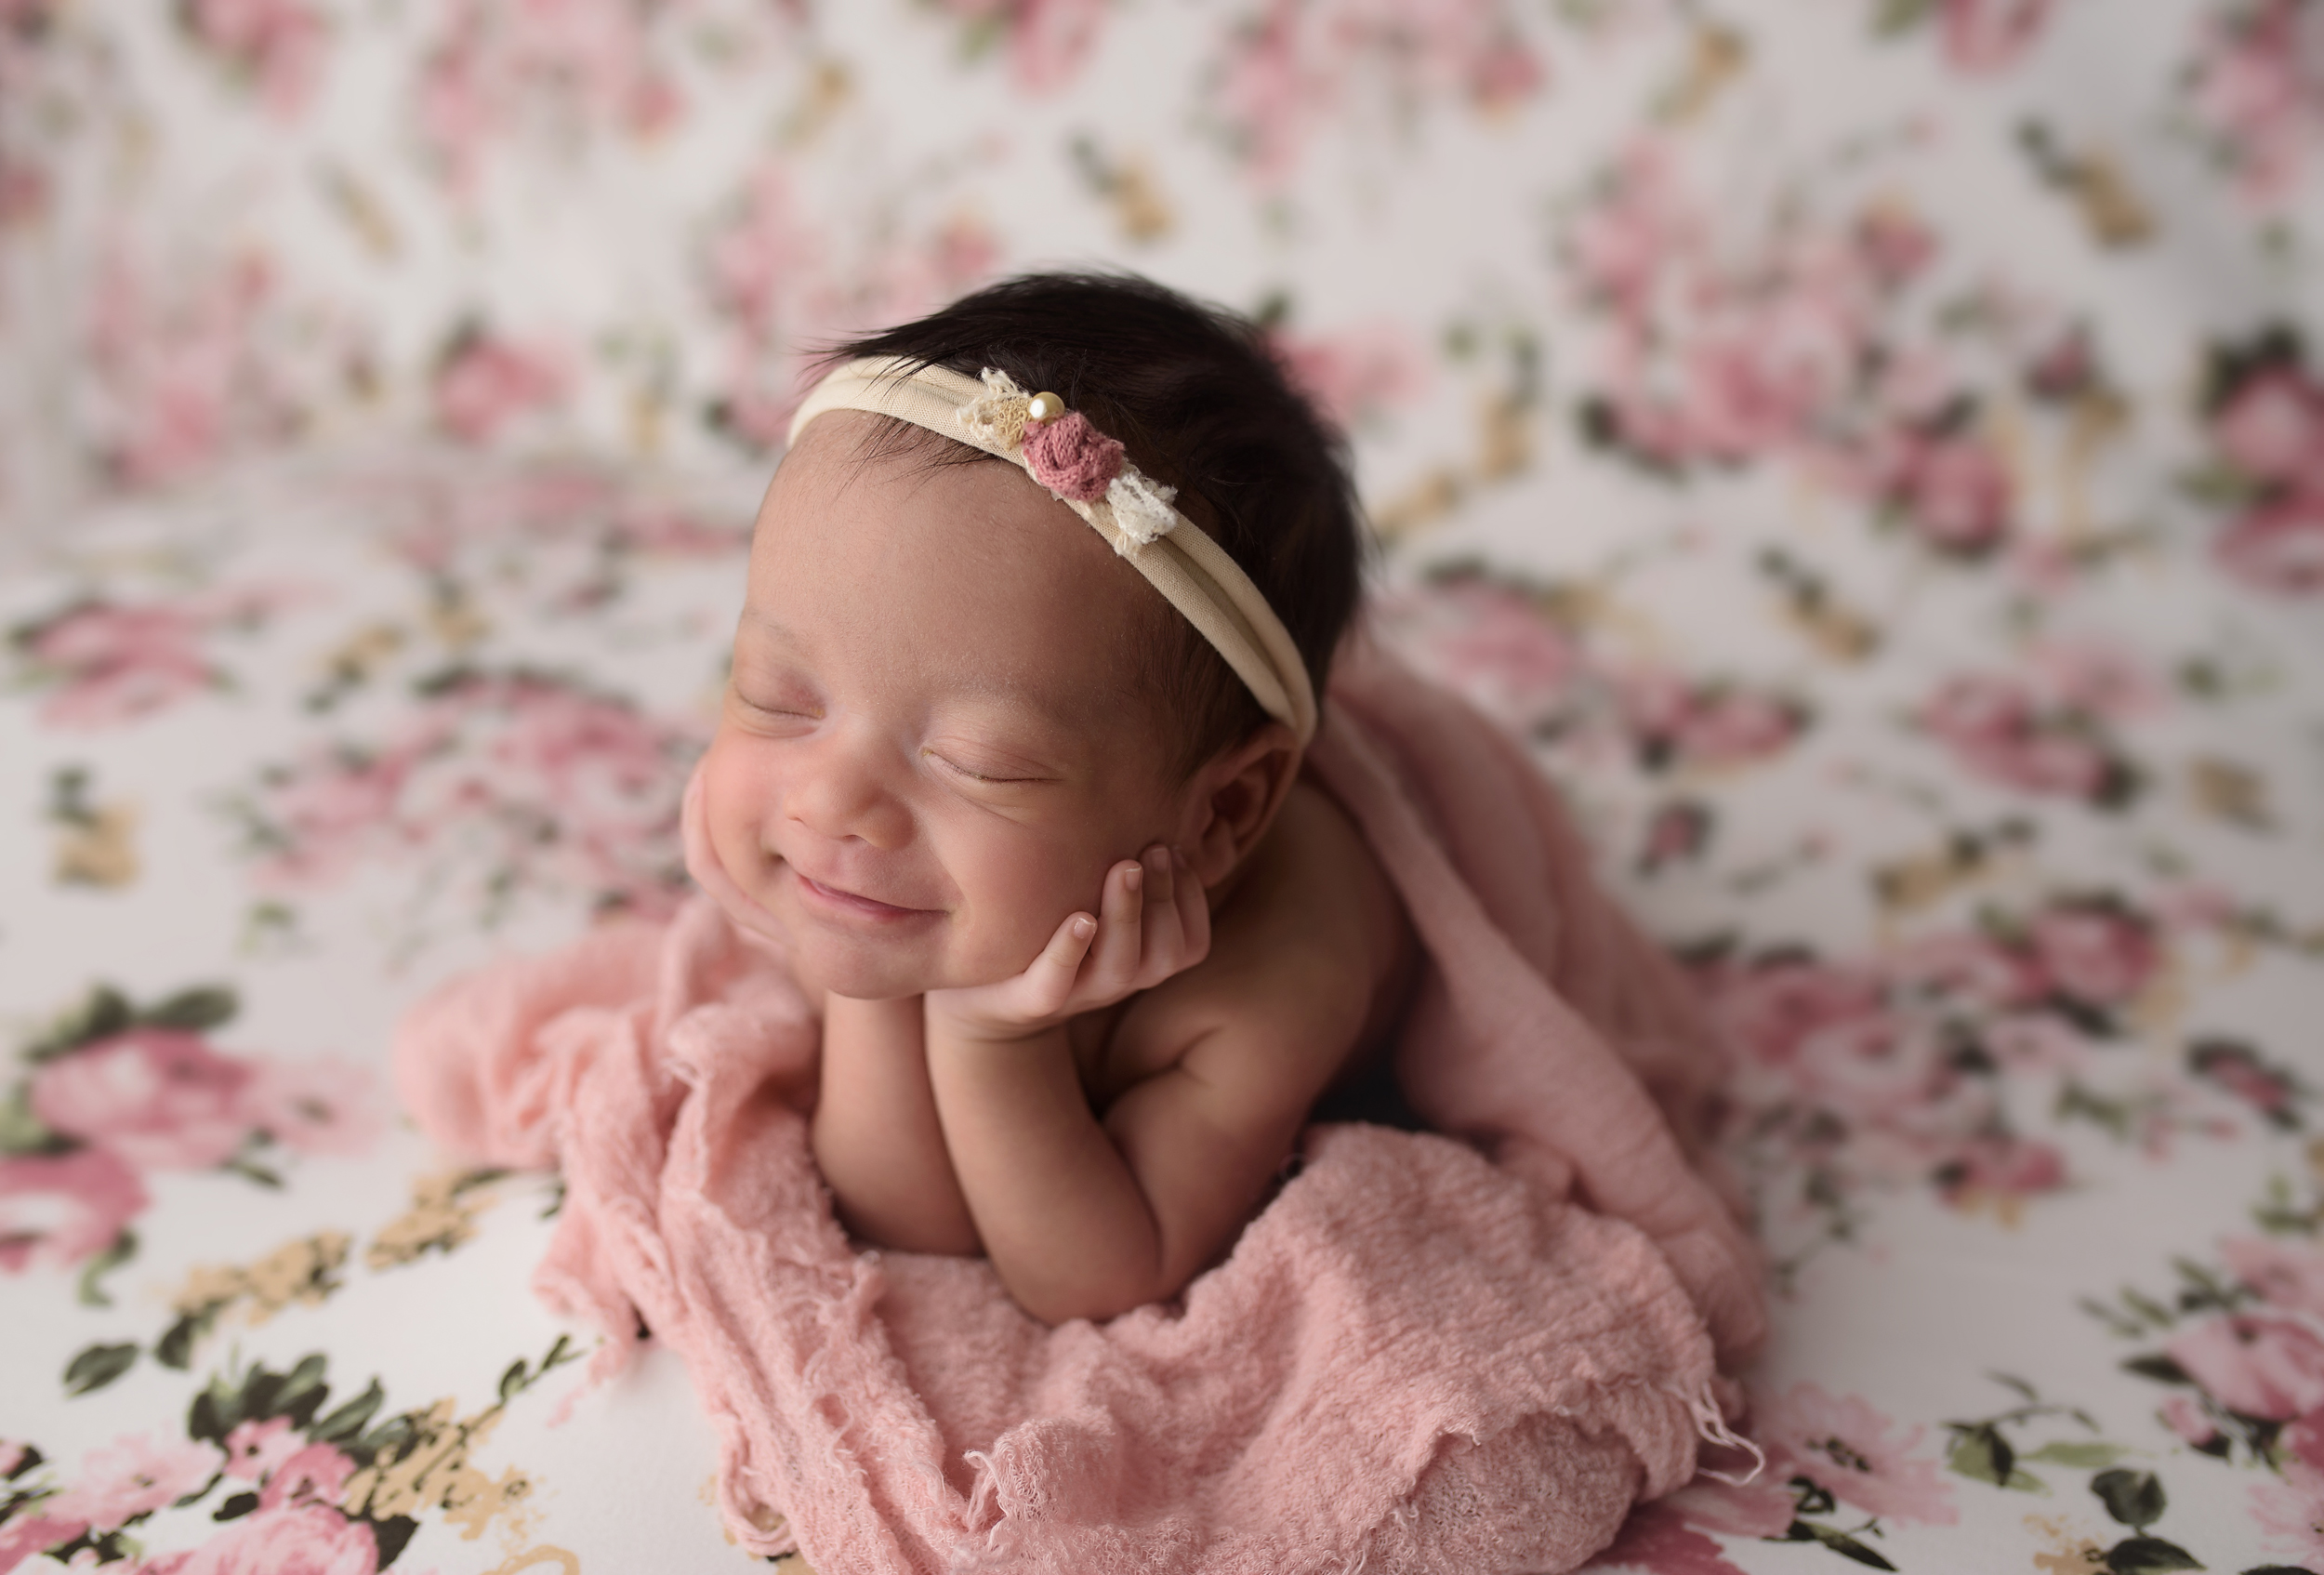 baby-newborn-infant-photographer-photography-wellington-lake-worth-boynton-beach-delray-beach-parkland-boca-raton-jupiter-tequesta-captured-moments-by-dawn.jpg